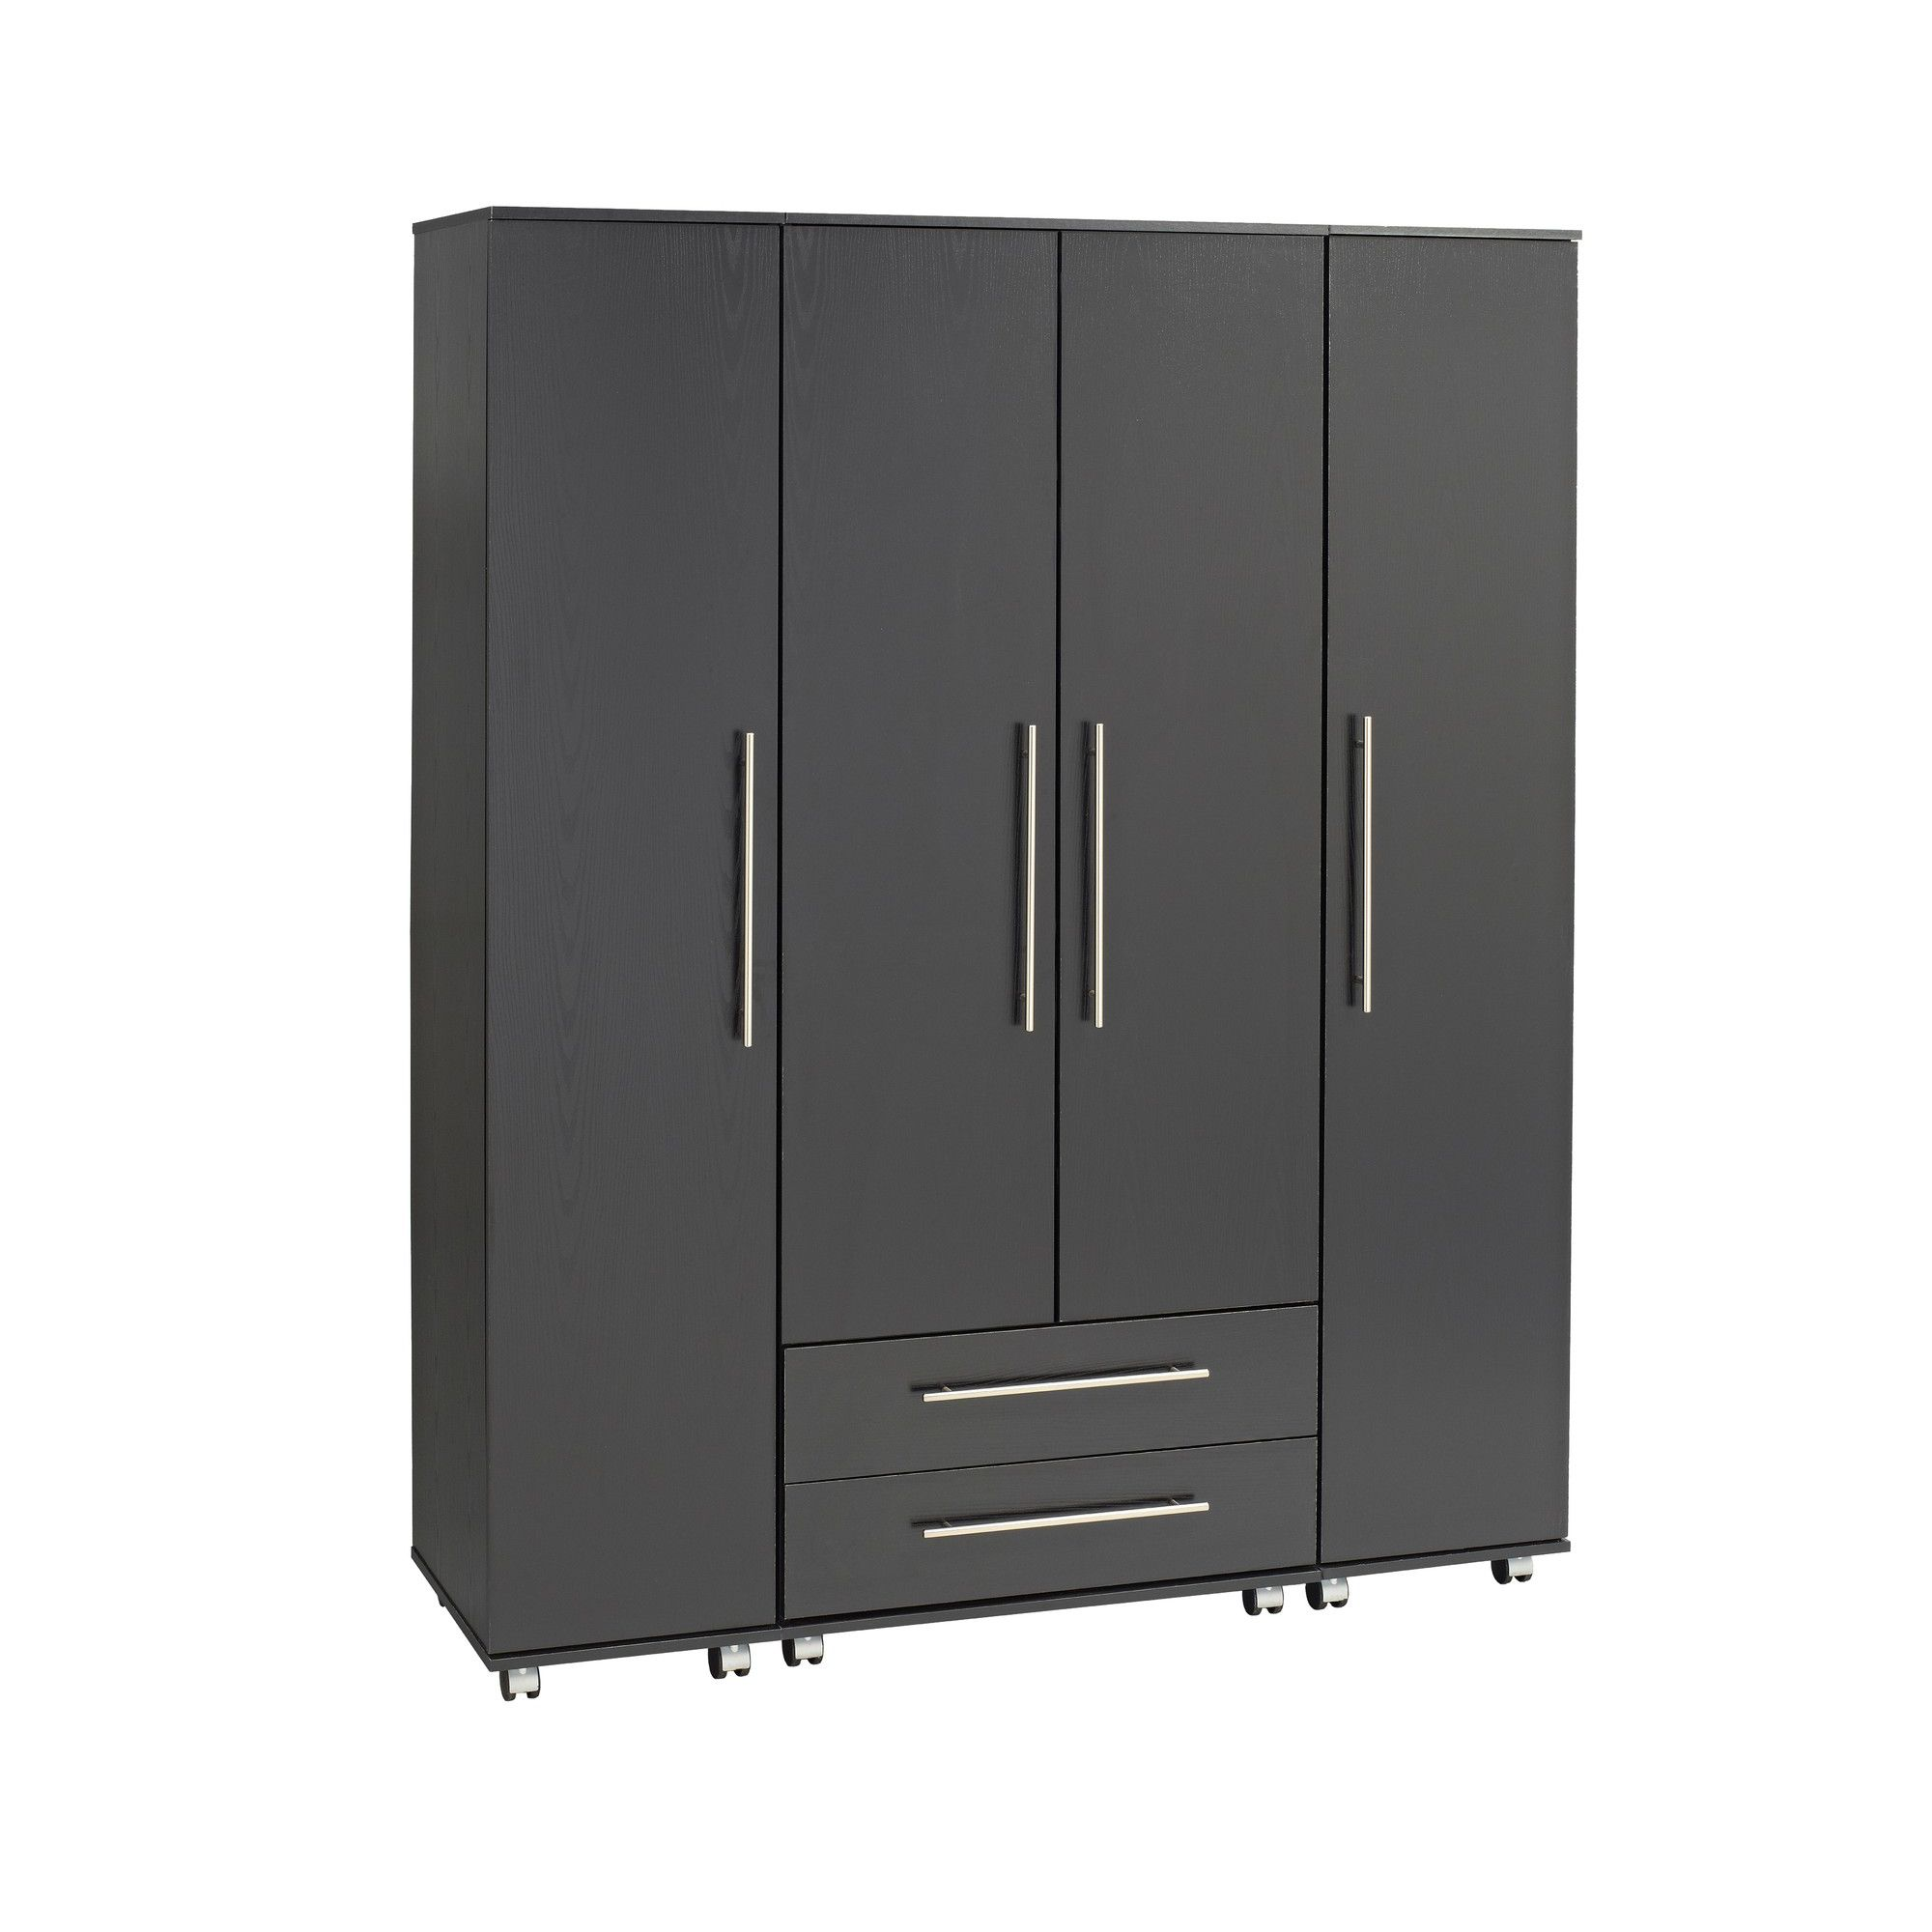 Ideal Furniture Bobby 4 Door Wardrobe - White at Tesco Direct